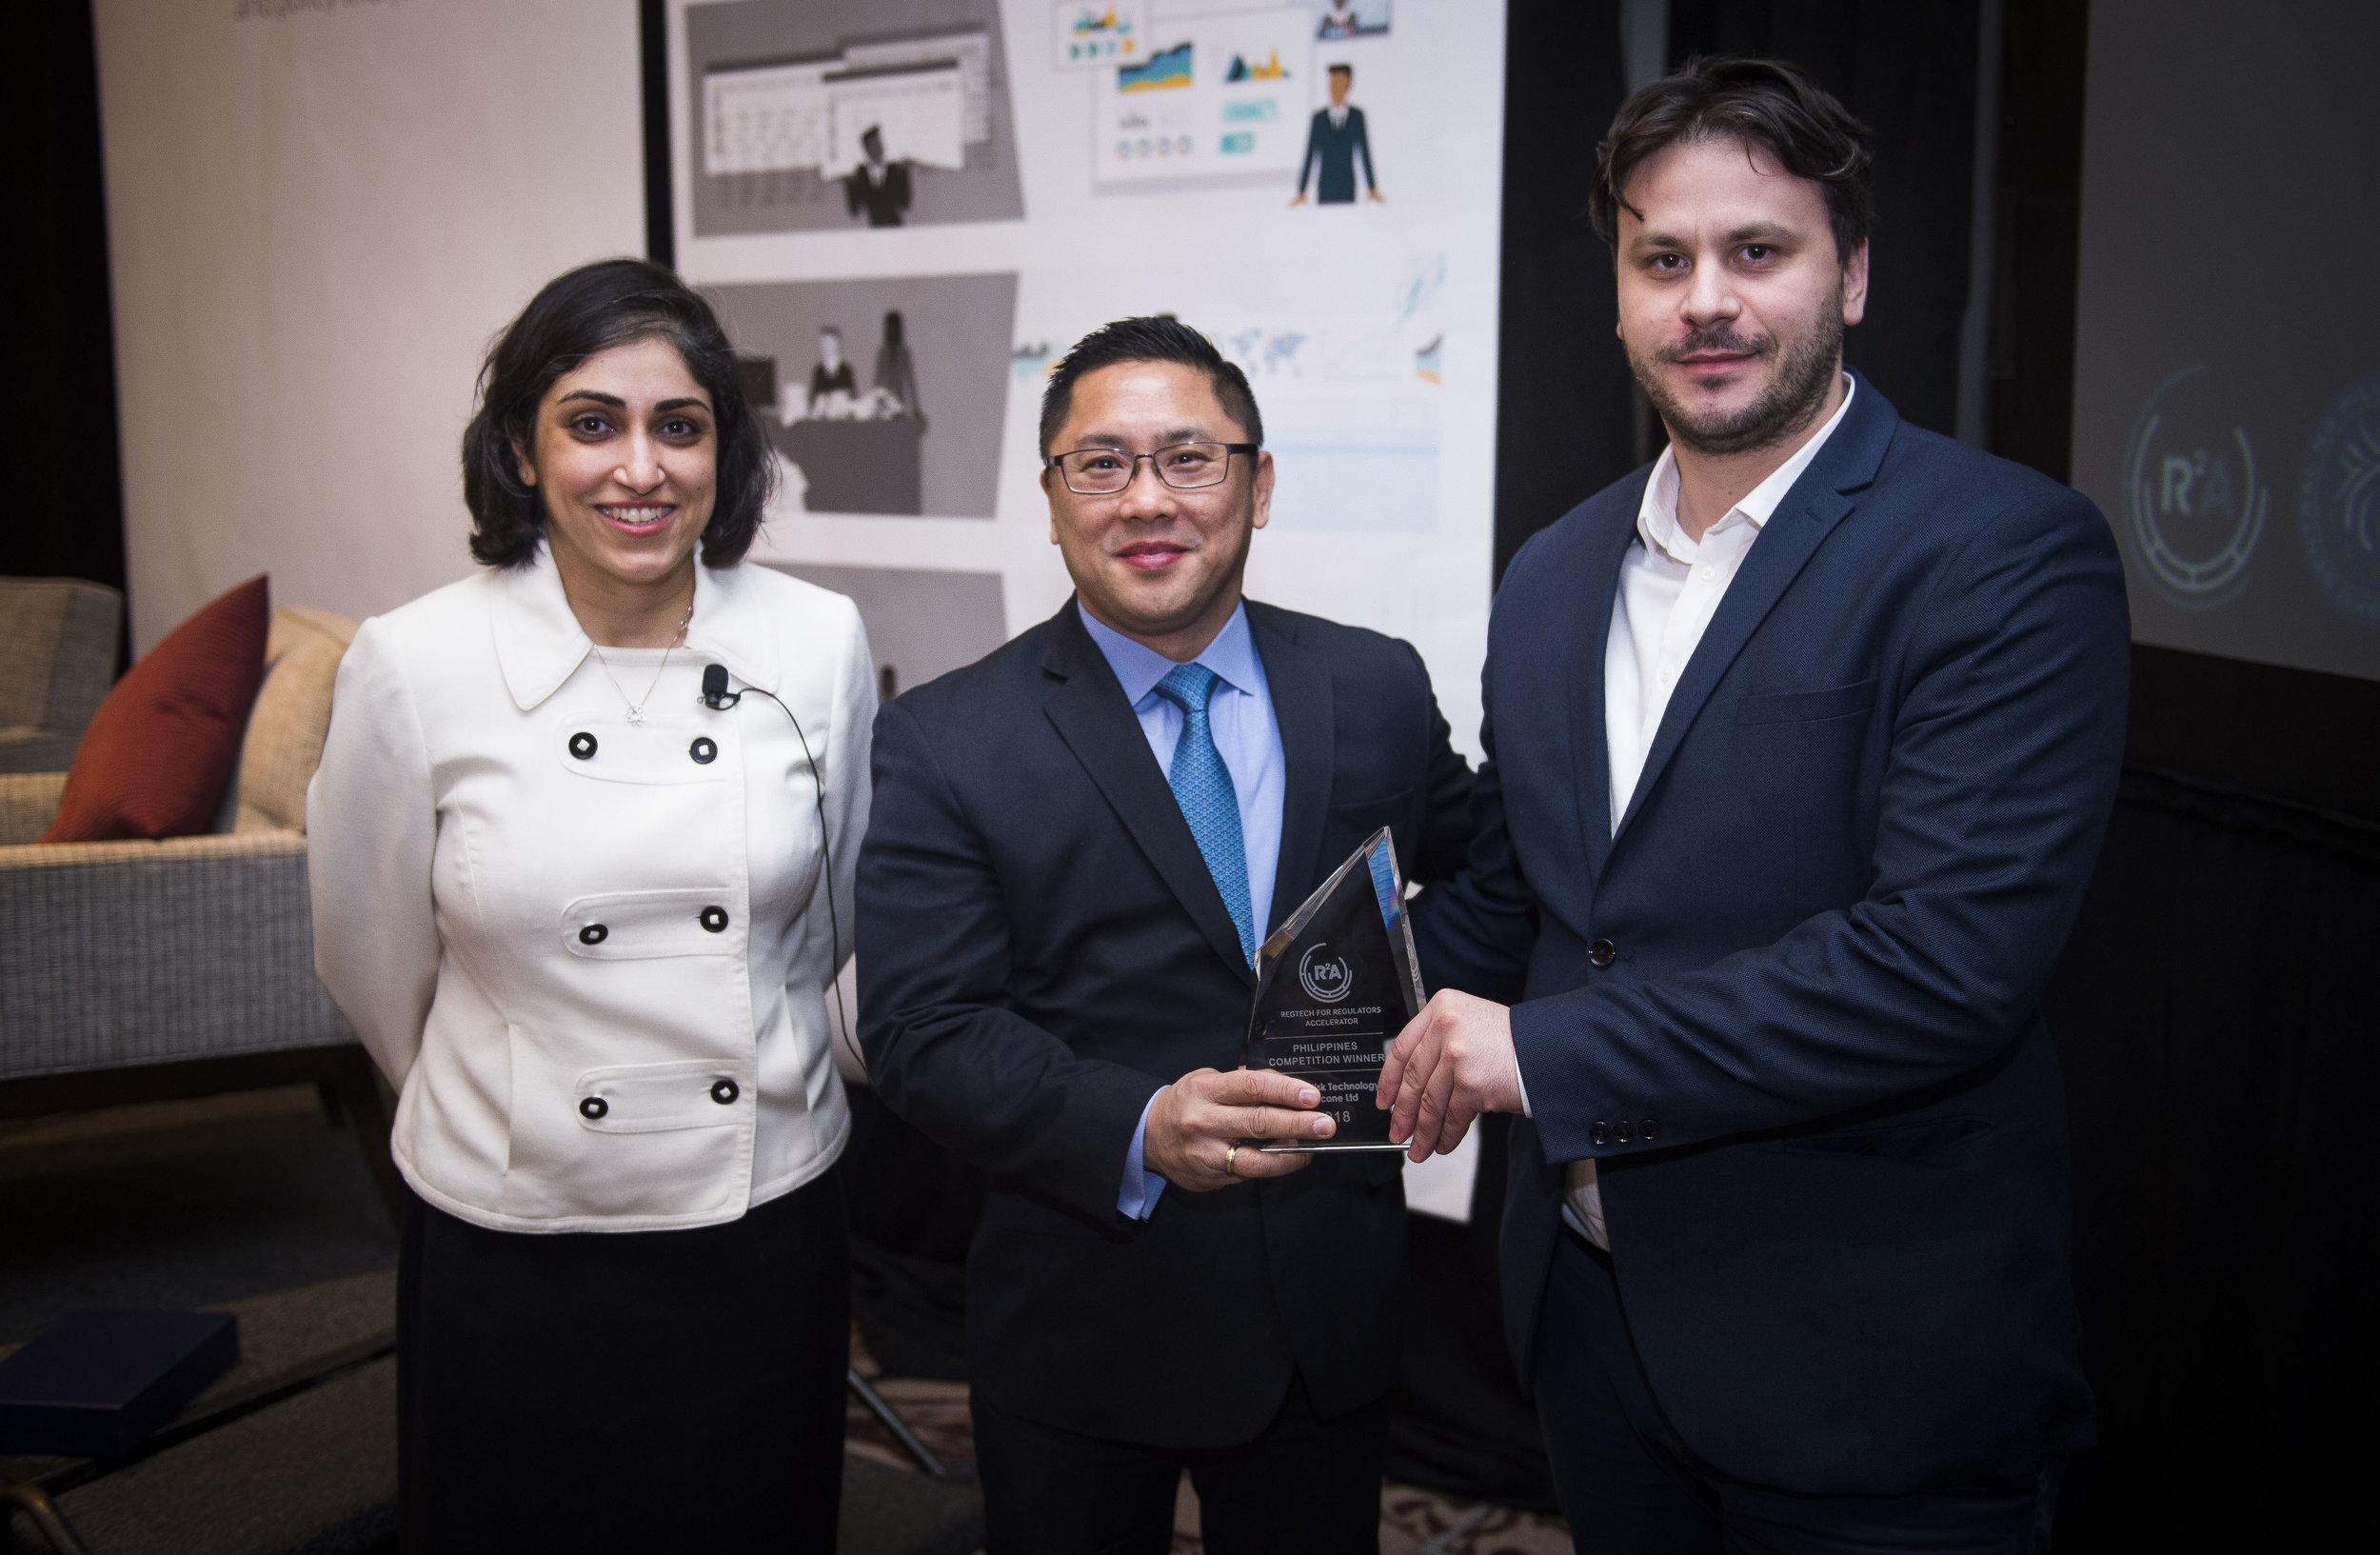 From left: Rosita Najmi (Bill & Melinda Gates Foundation), Vicente De Villa (Bangko Sentral ng Pilipinas), and Dragan Oremuš (Compliant Risk Technology LLC)